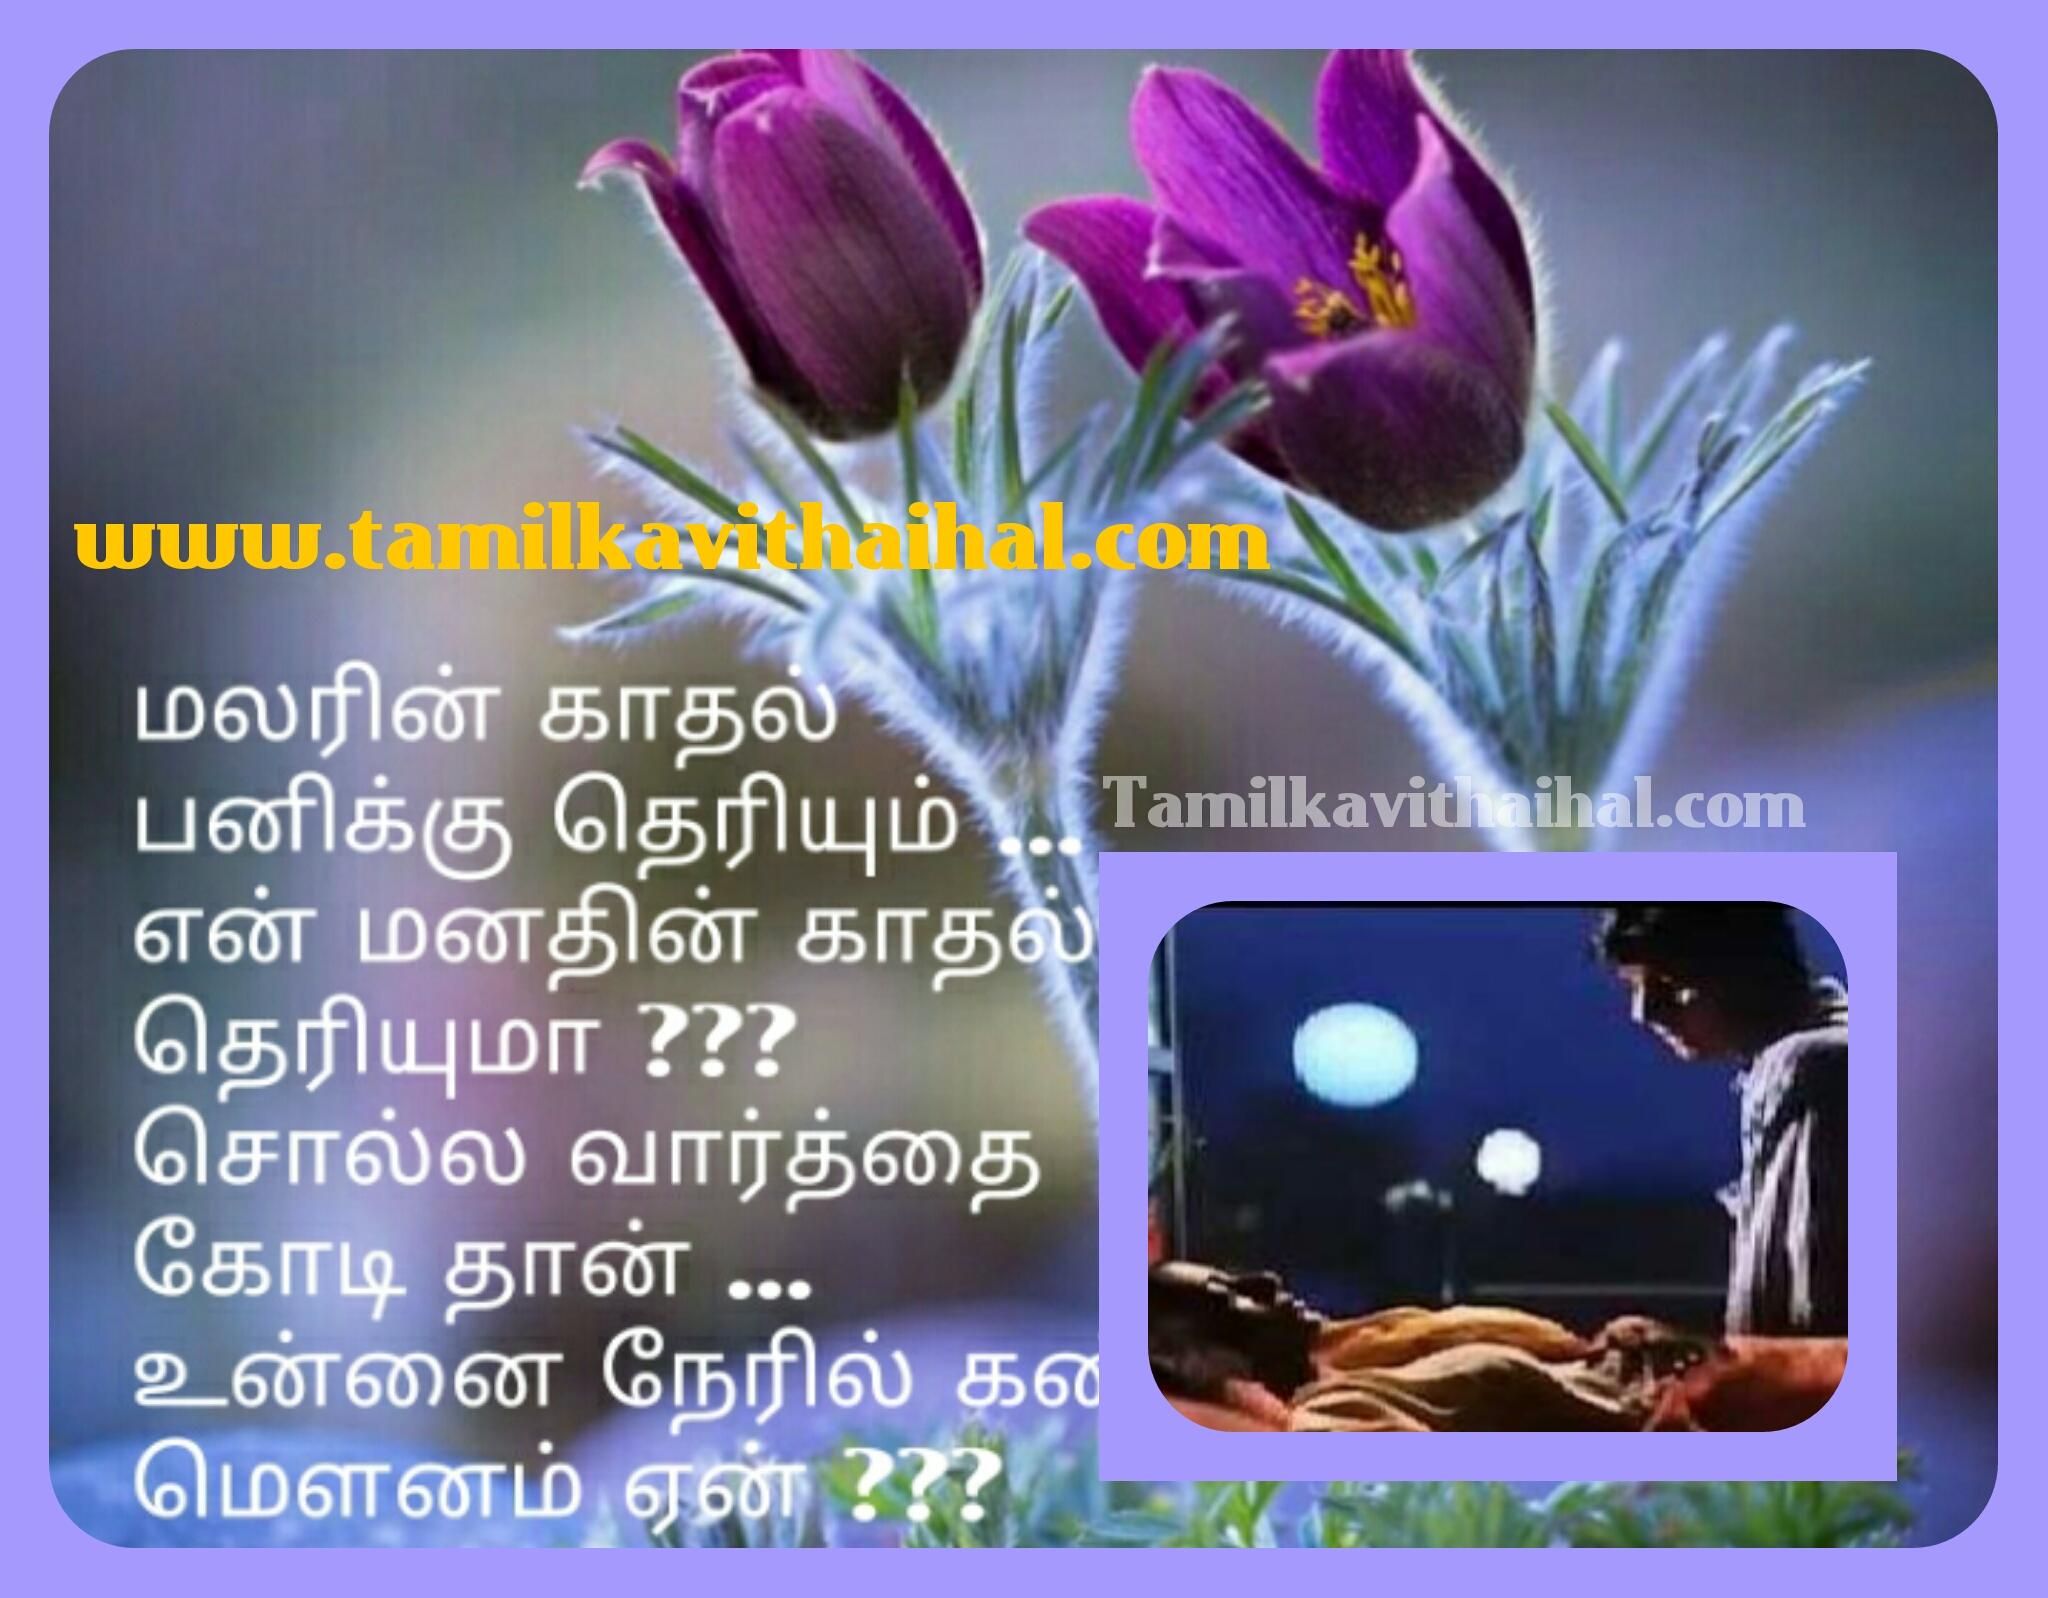 Tamil sad song quotes and lyrics kadhal desam sogamana padal varigal